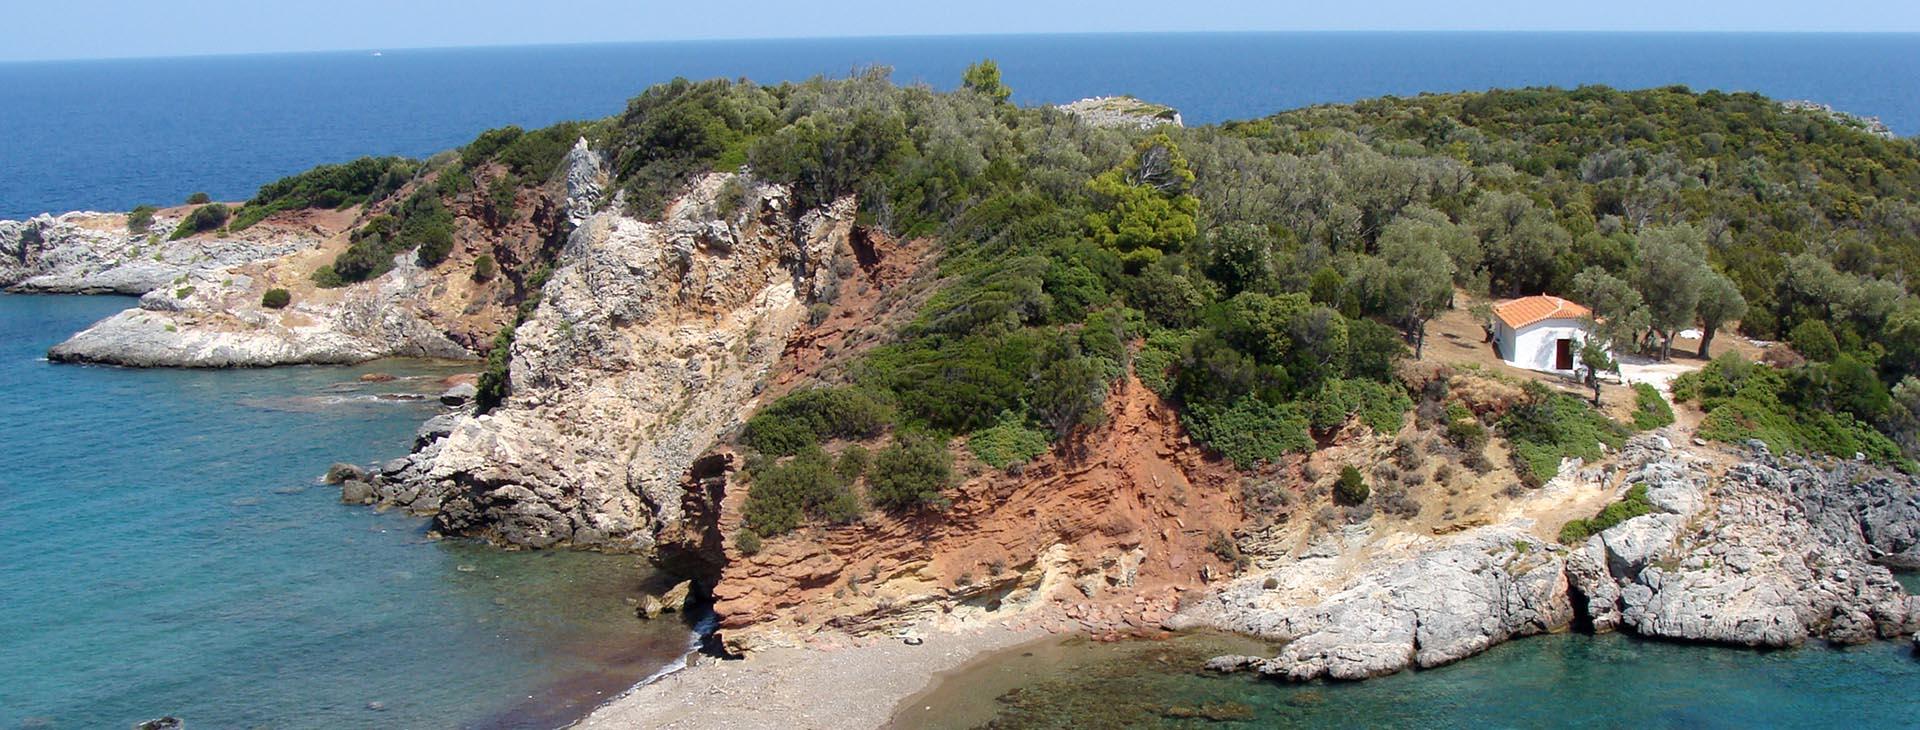 Cape Agios Vasilios, Evia